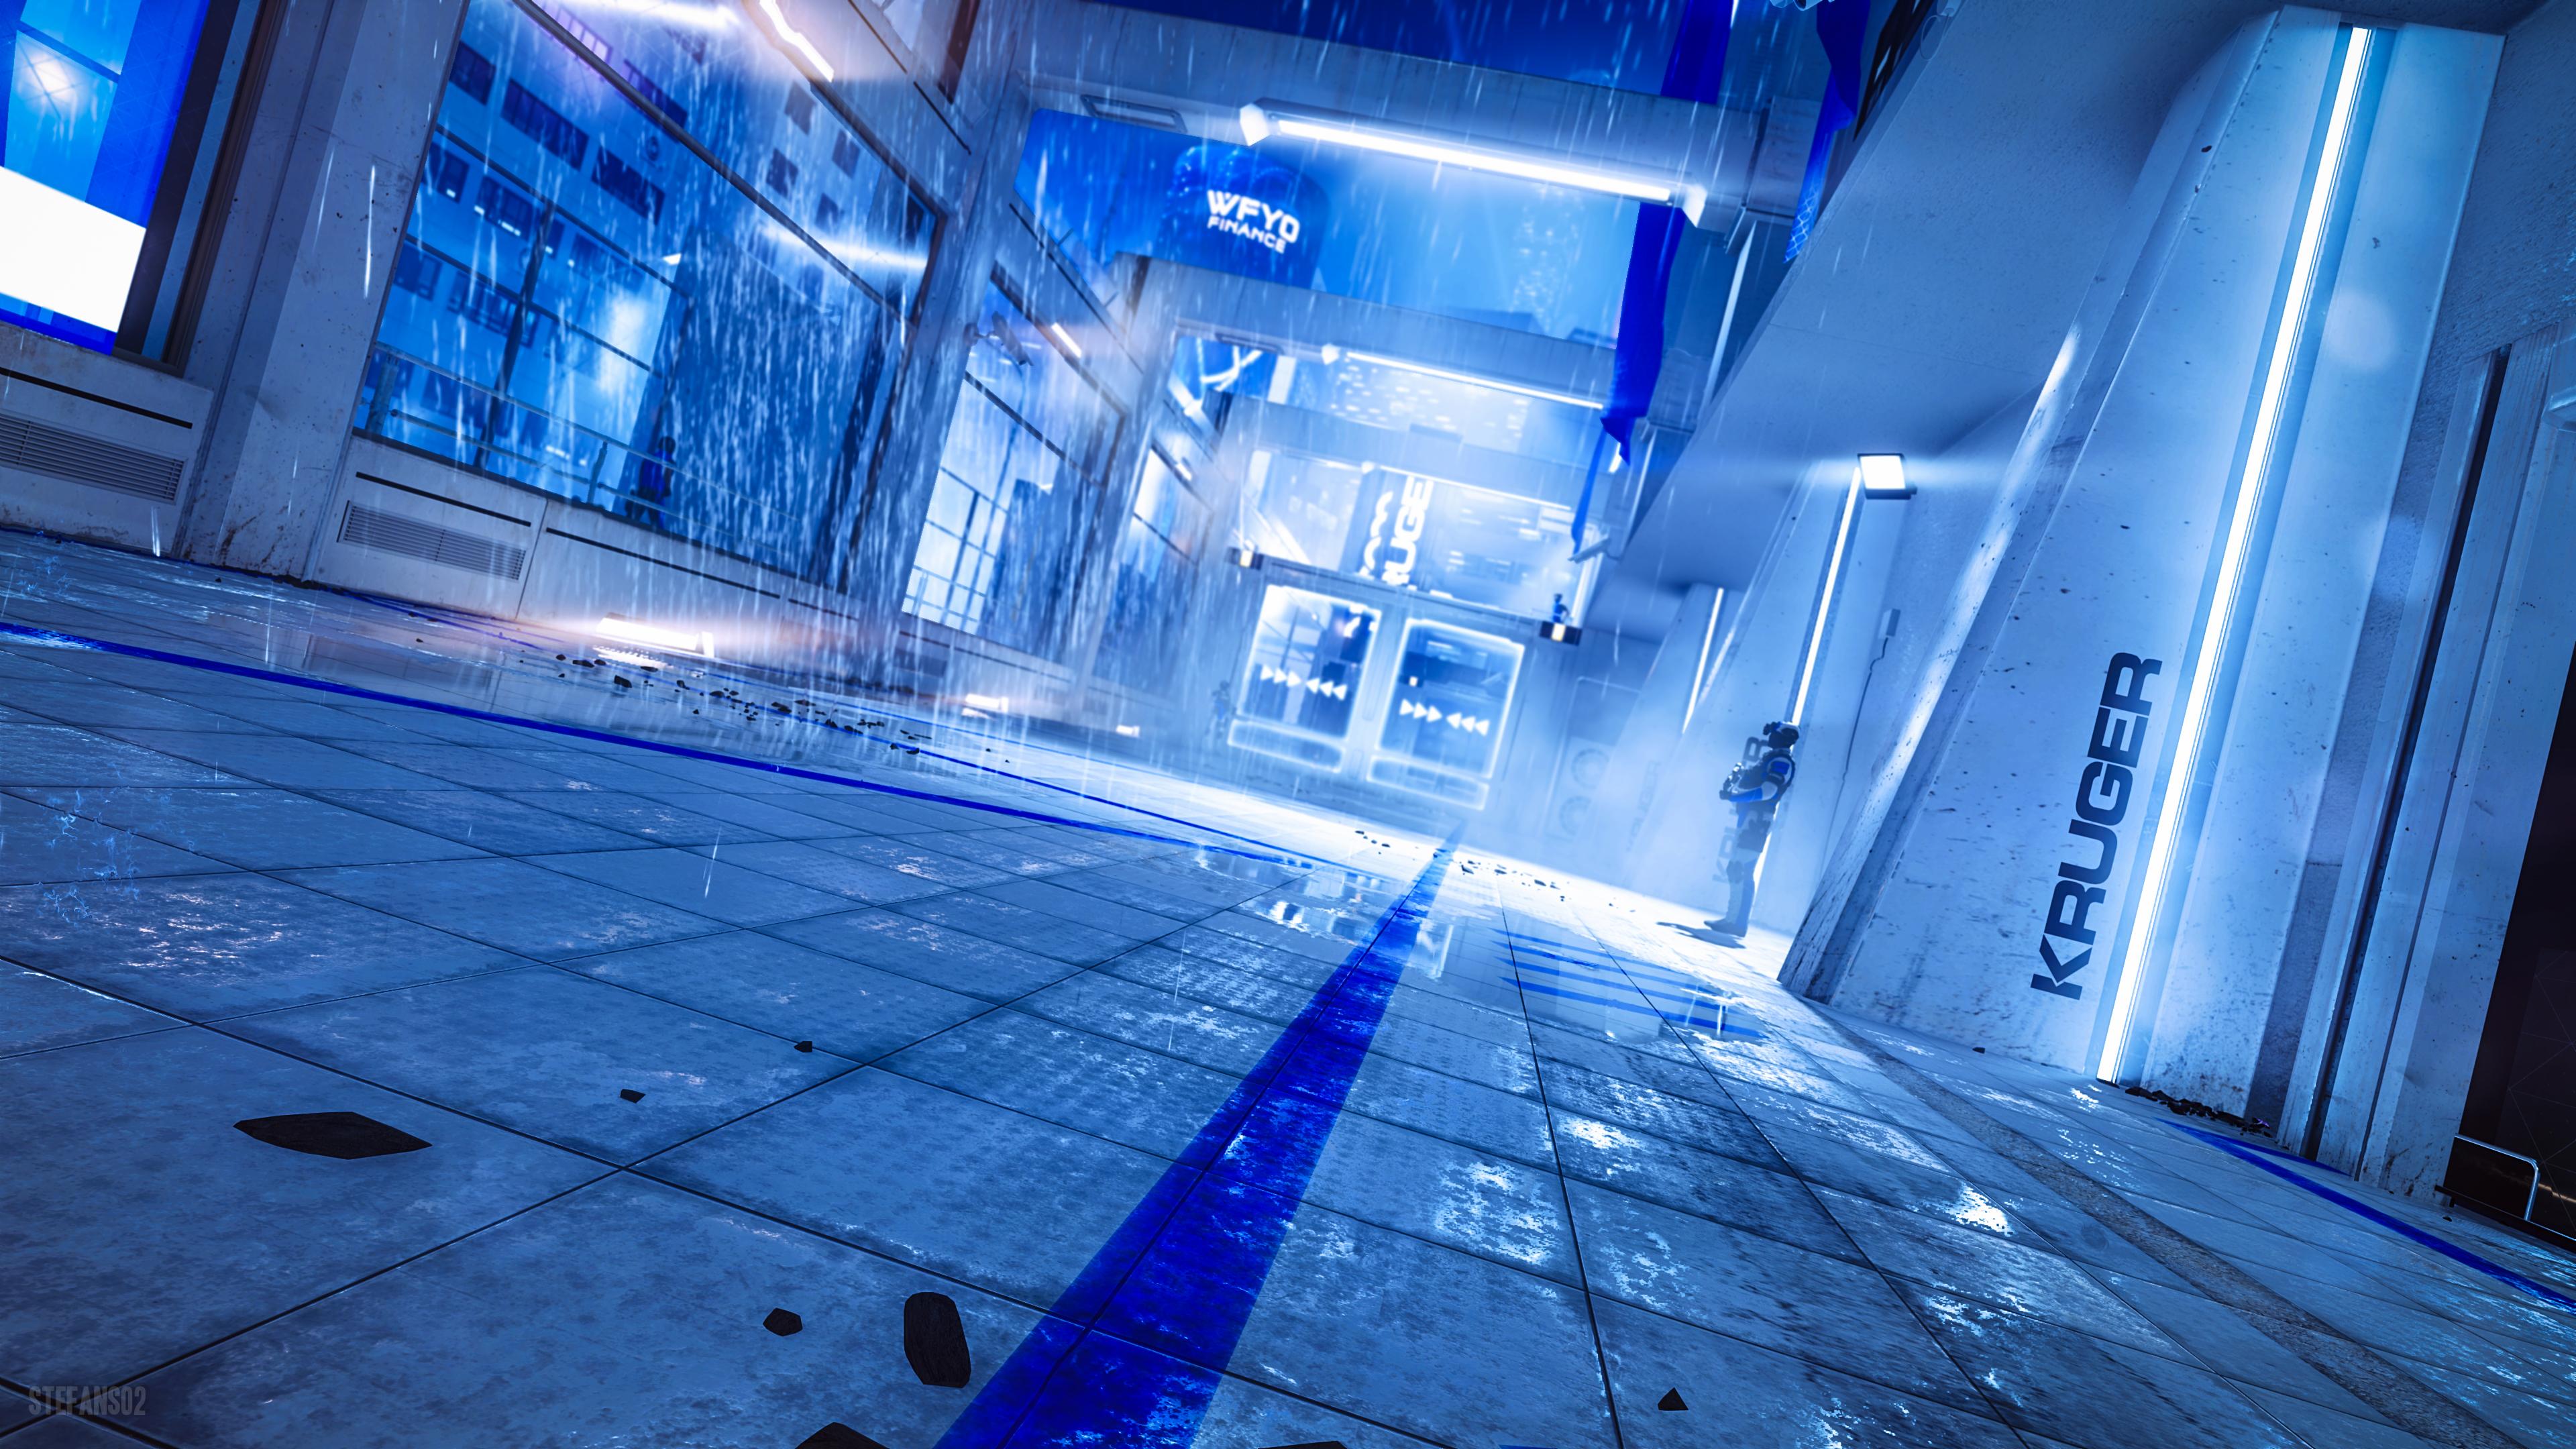 Mirror S Edge Catalyst Raining At Kruger S 4k Ultra Hd Wallpaper